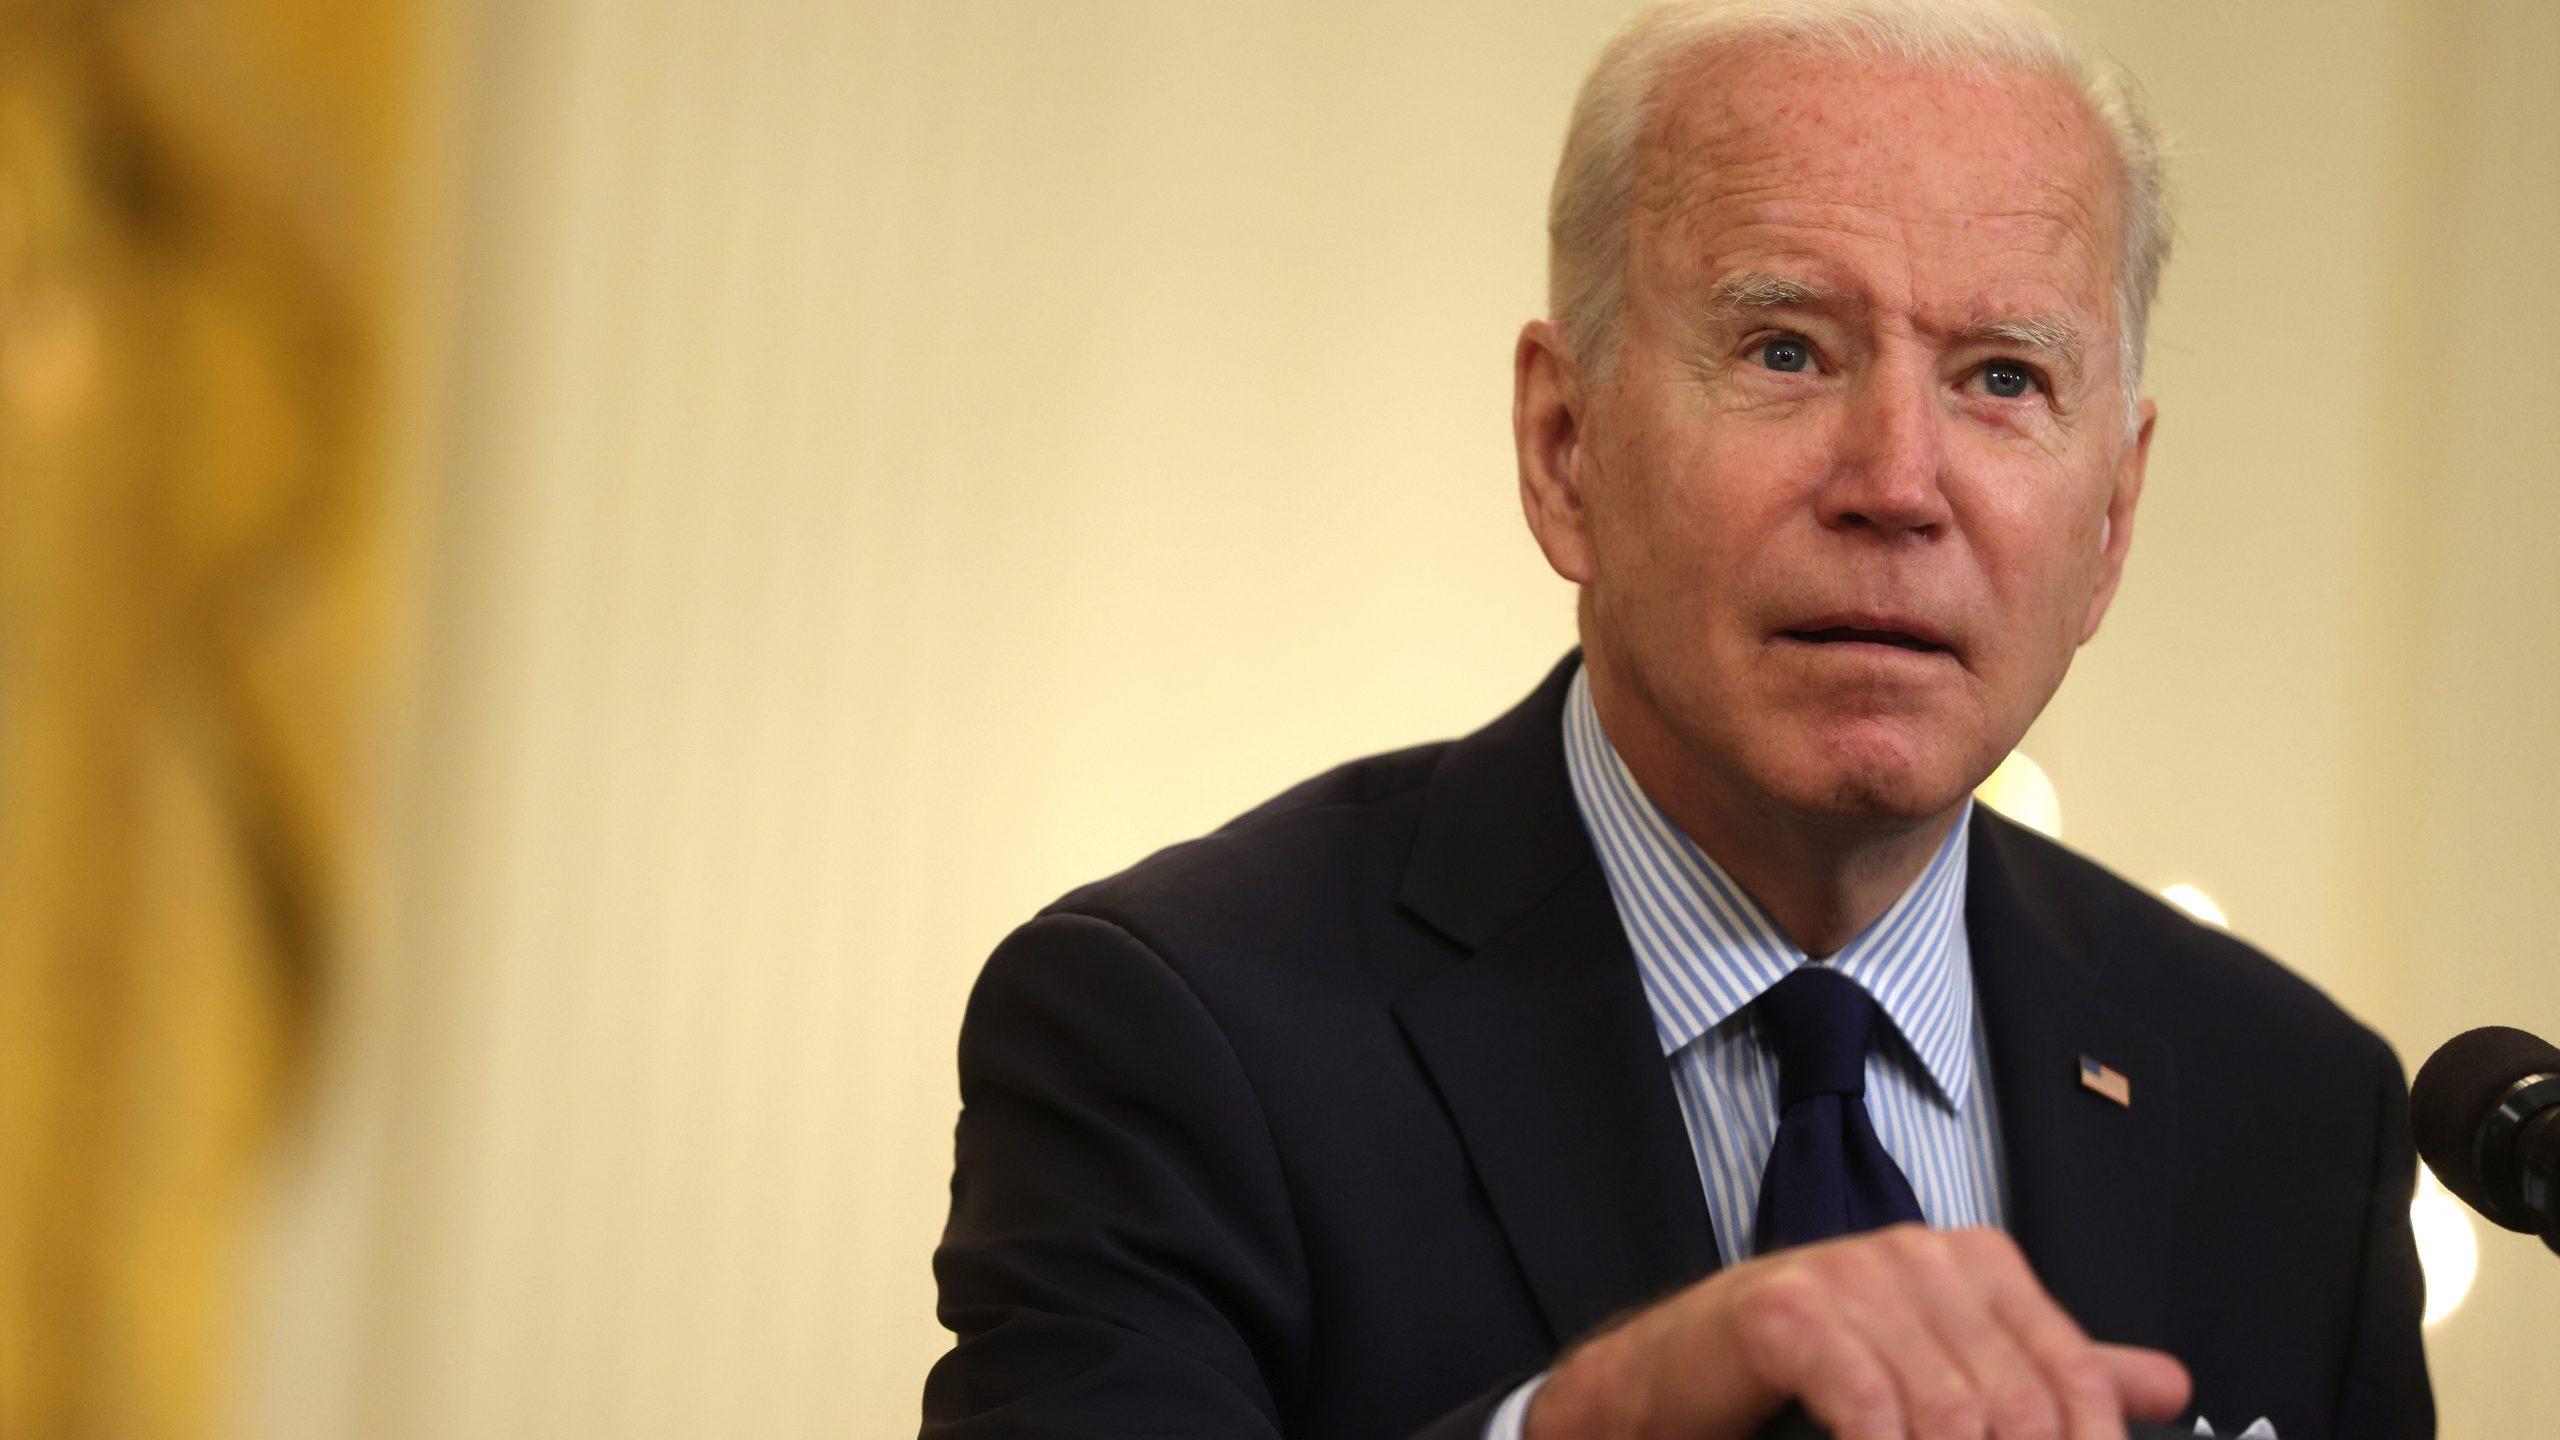 Congressional Dems 'Skeptical' Of Biden Tax Hikes, Fear Agenda 'Dangling By A Thread'